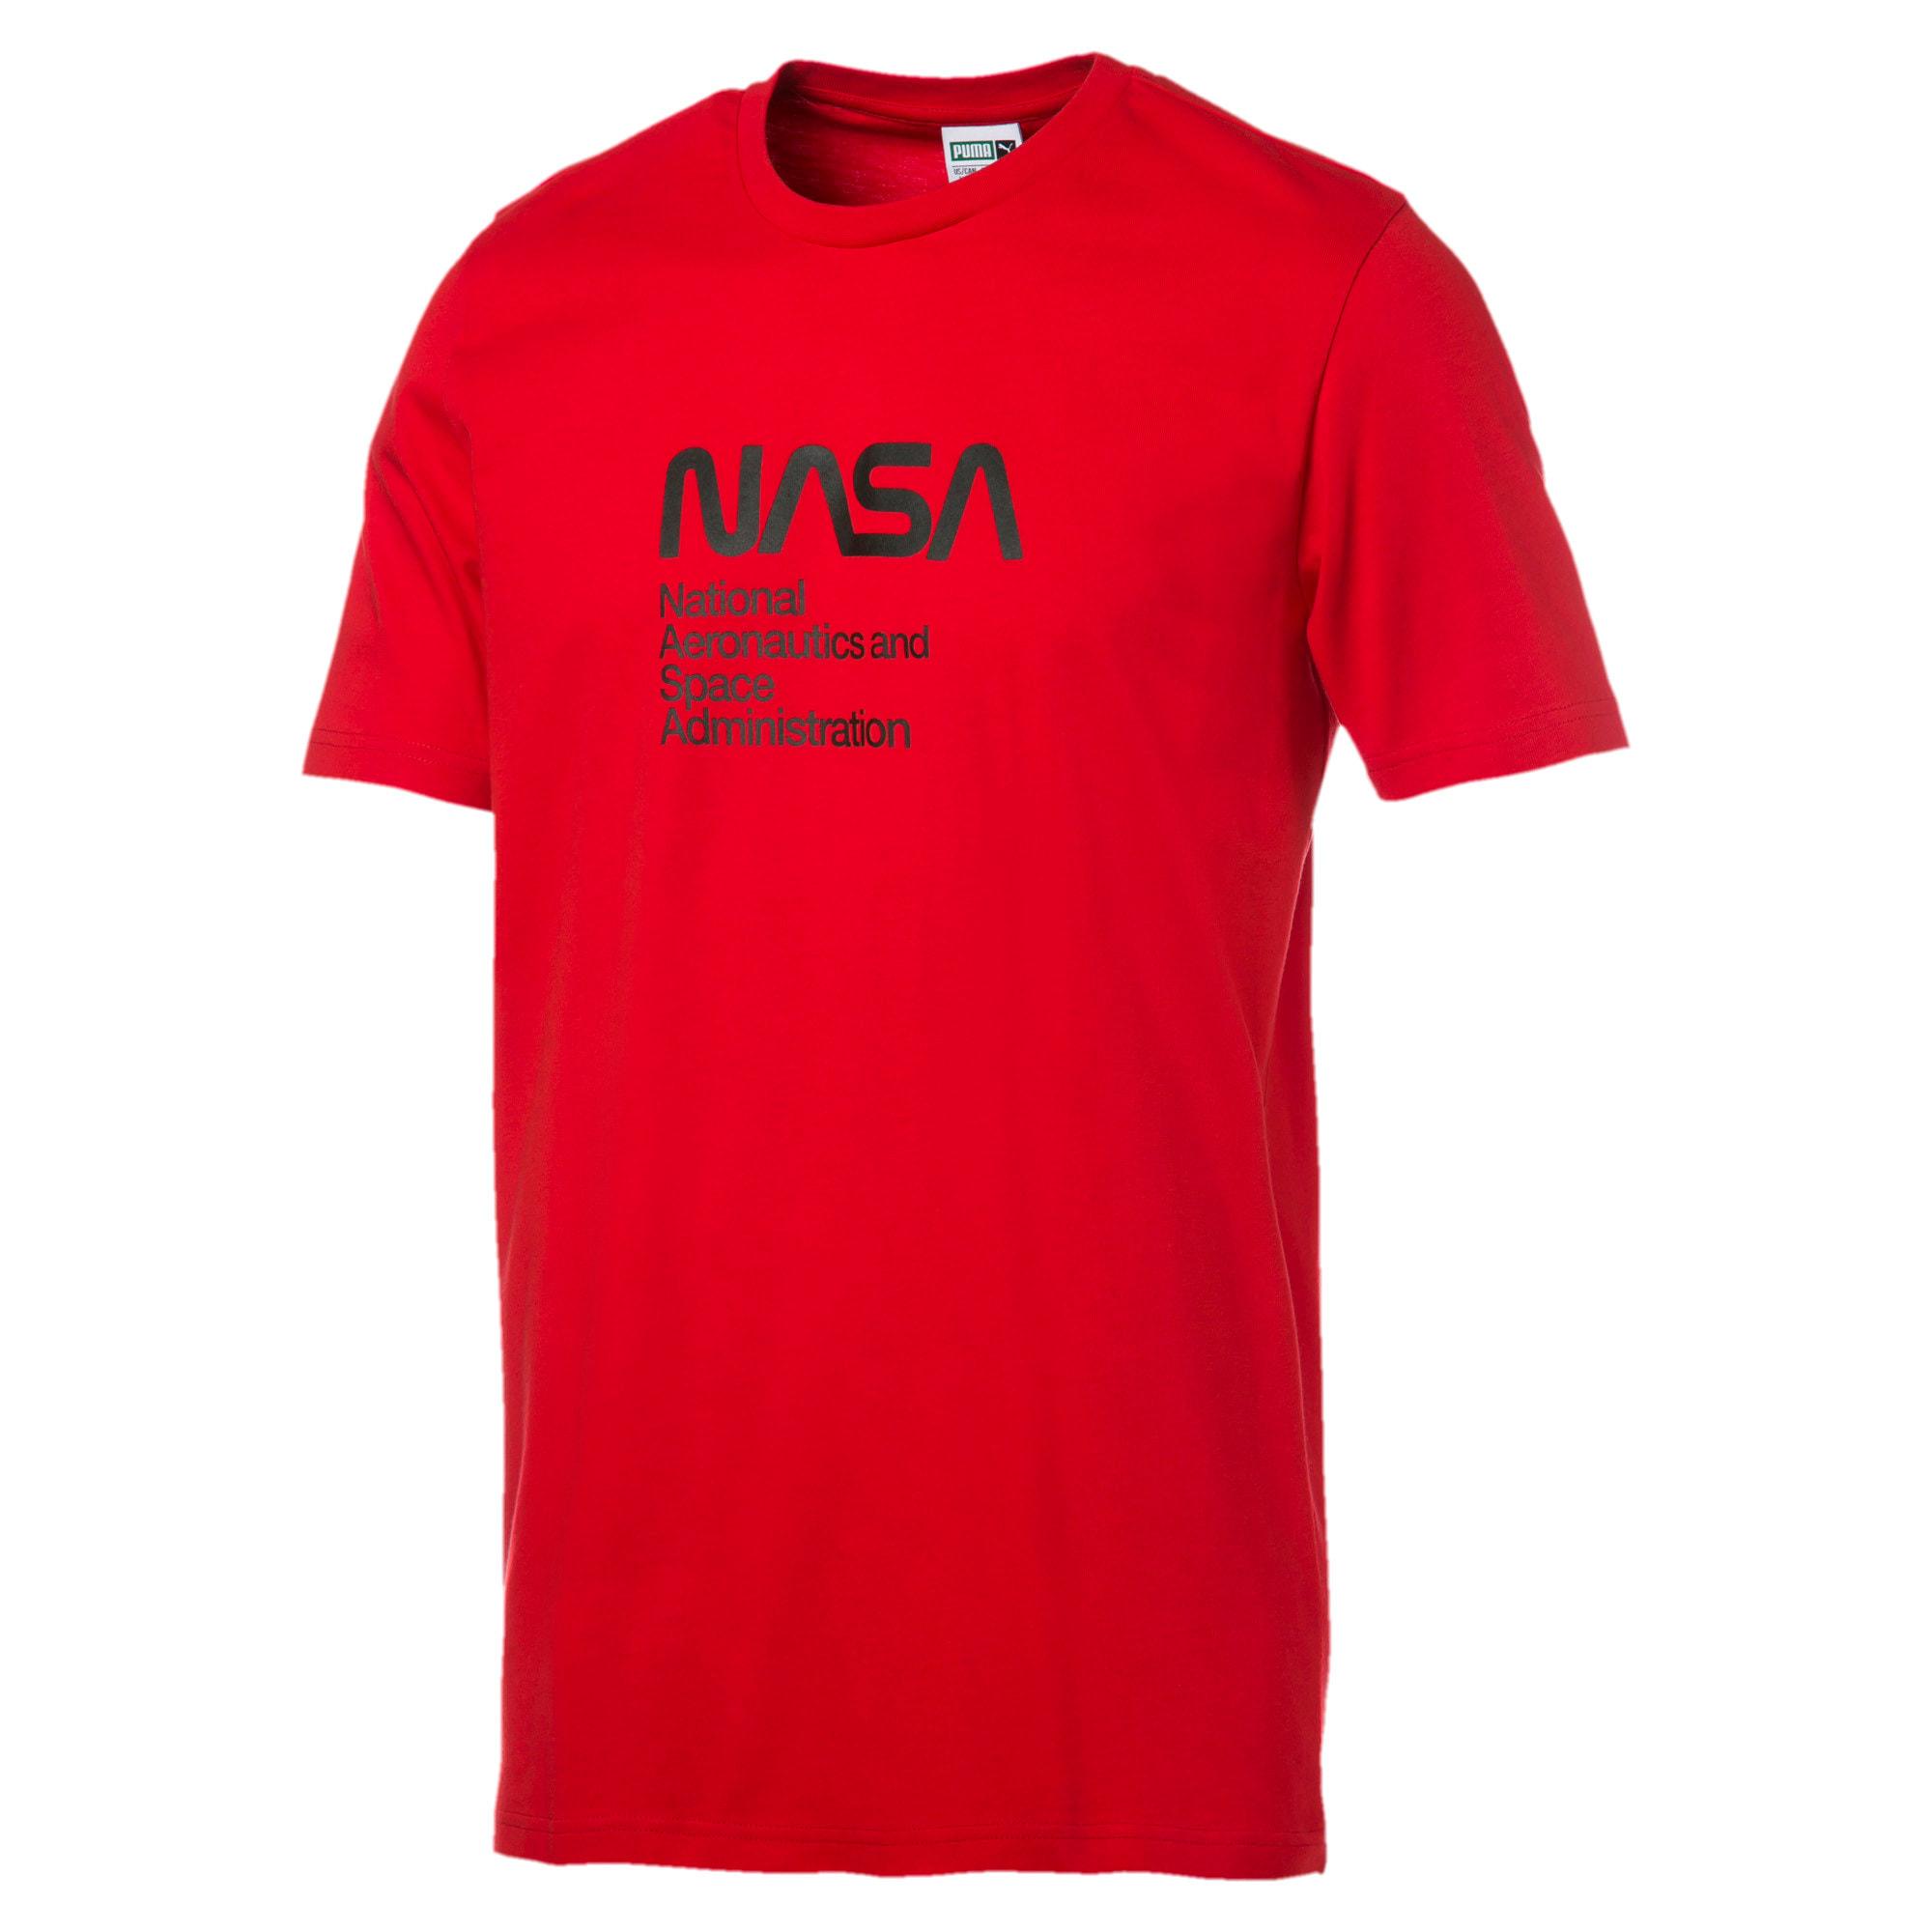 Thumbnail 1 of PUMA x Space Agency Men's Tee, High Risk Red, medium